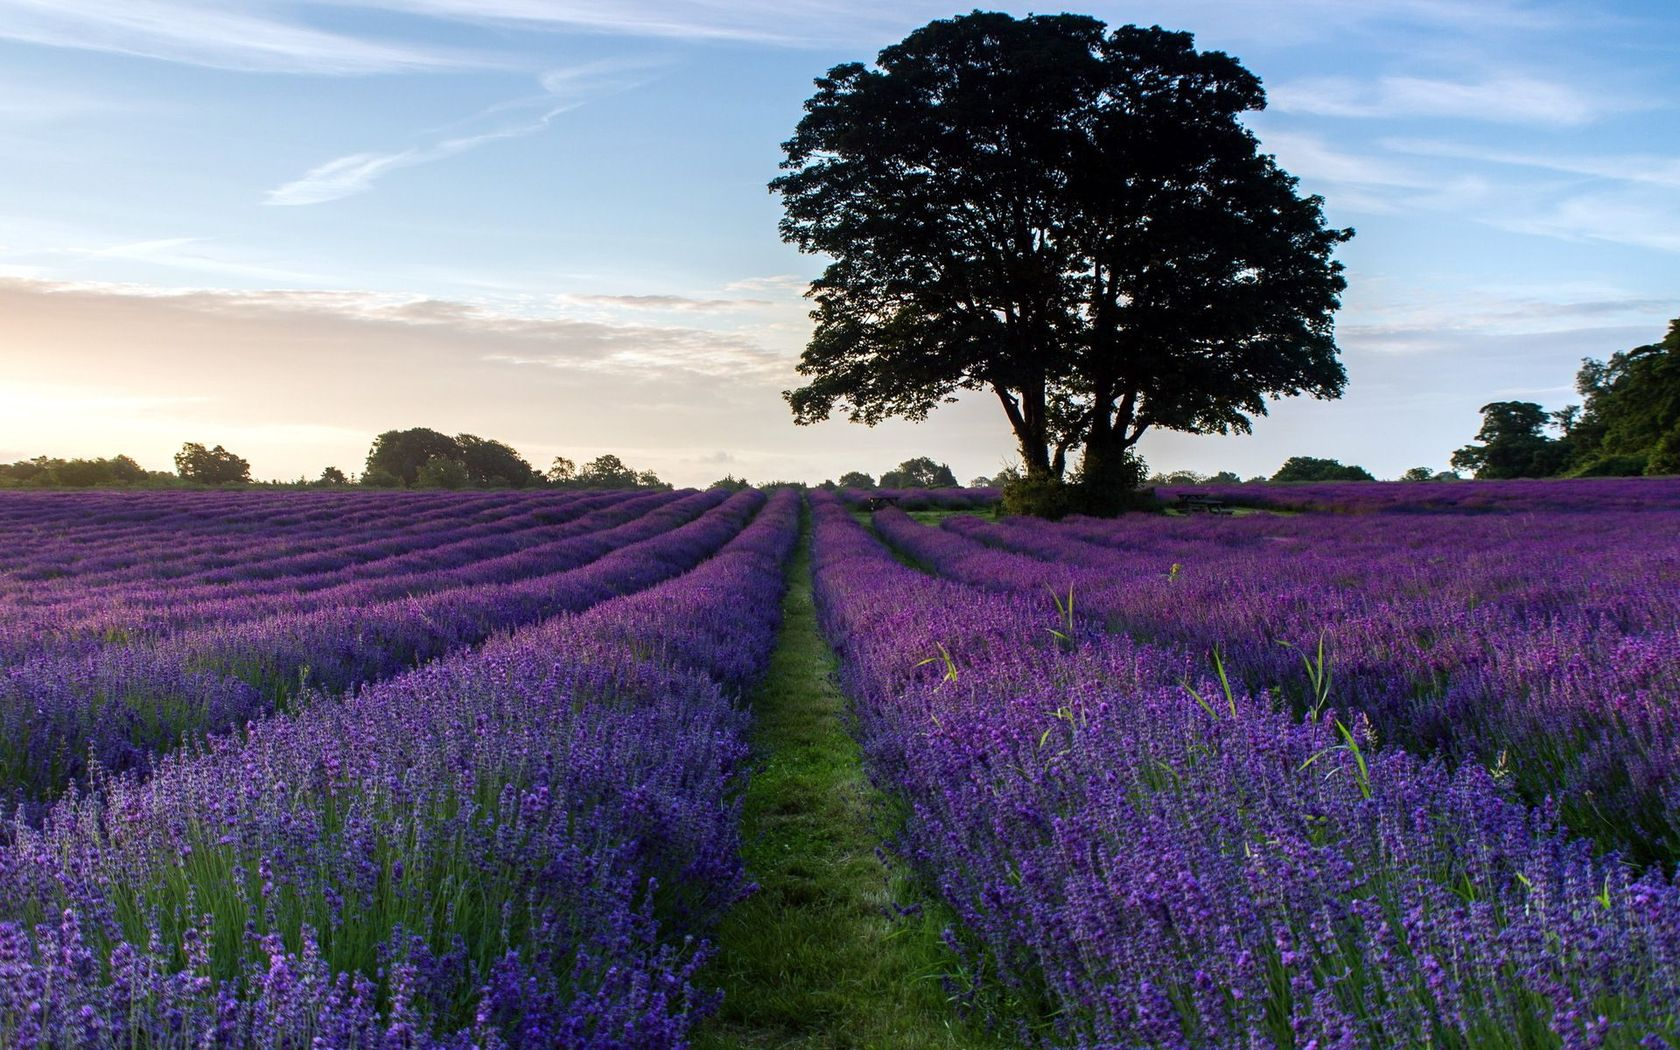 Lavender field wallpaper 20468 1680x1050